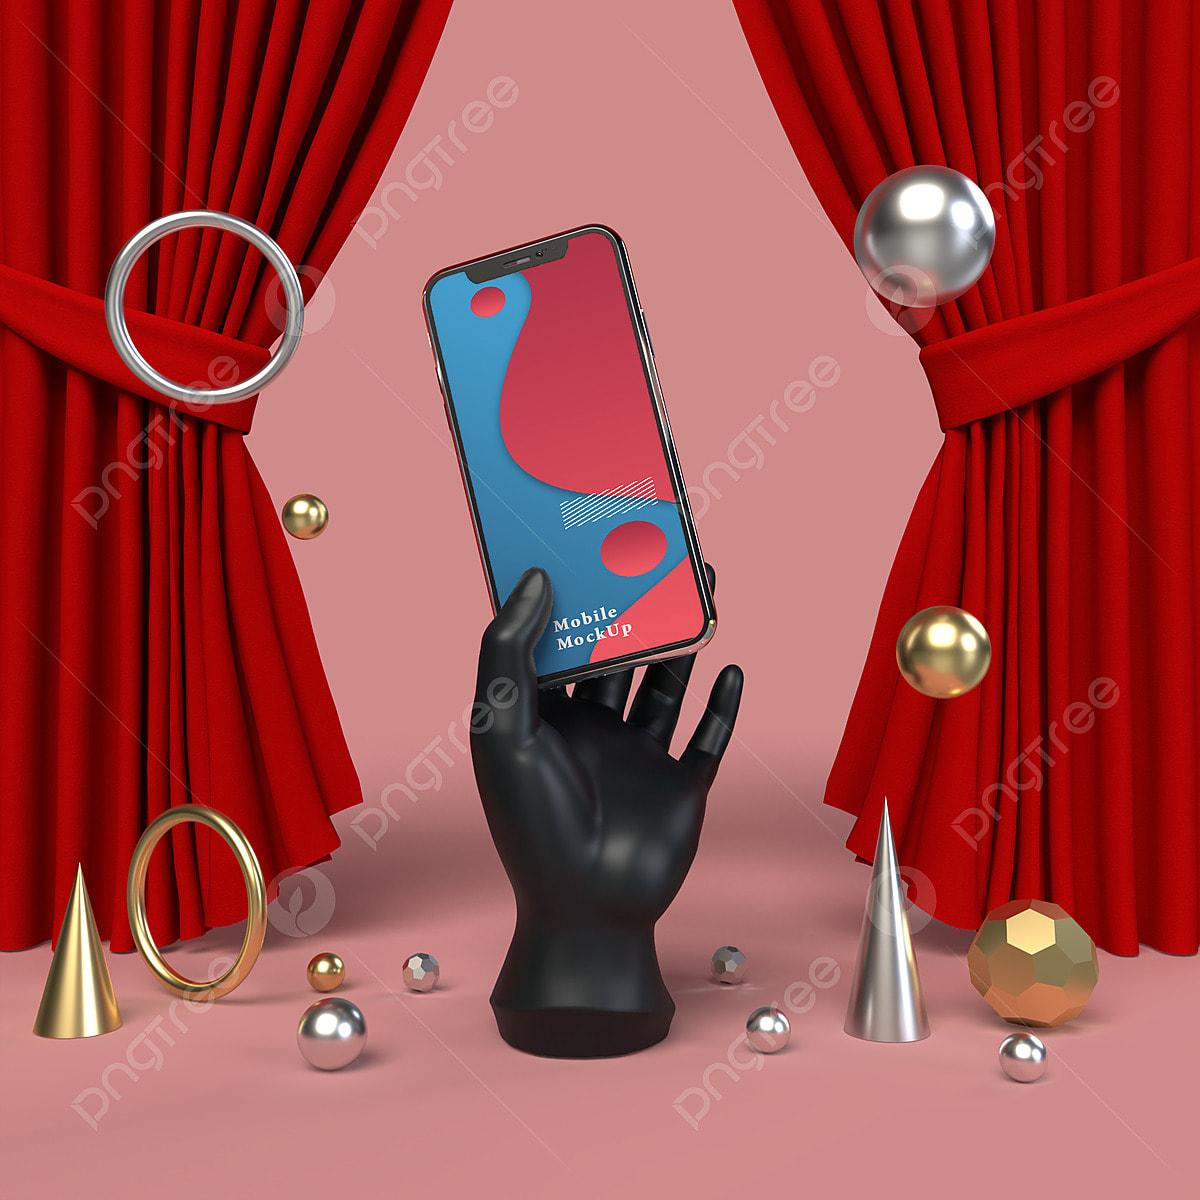 Smartphone Mock Up Phone Template For Infographic Or Presentation Ui Design  3d Render, Mock Up, Electronics, Website PNG Transparent Clipart Image and  PSD File for Free Download